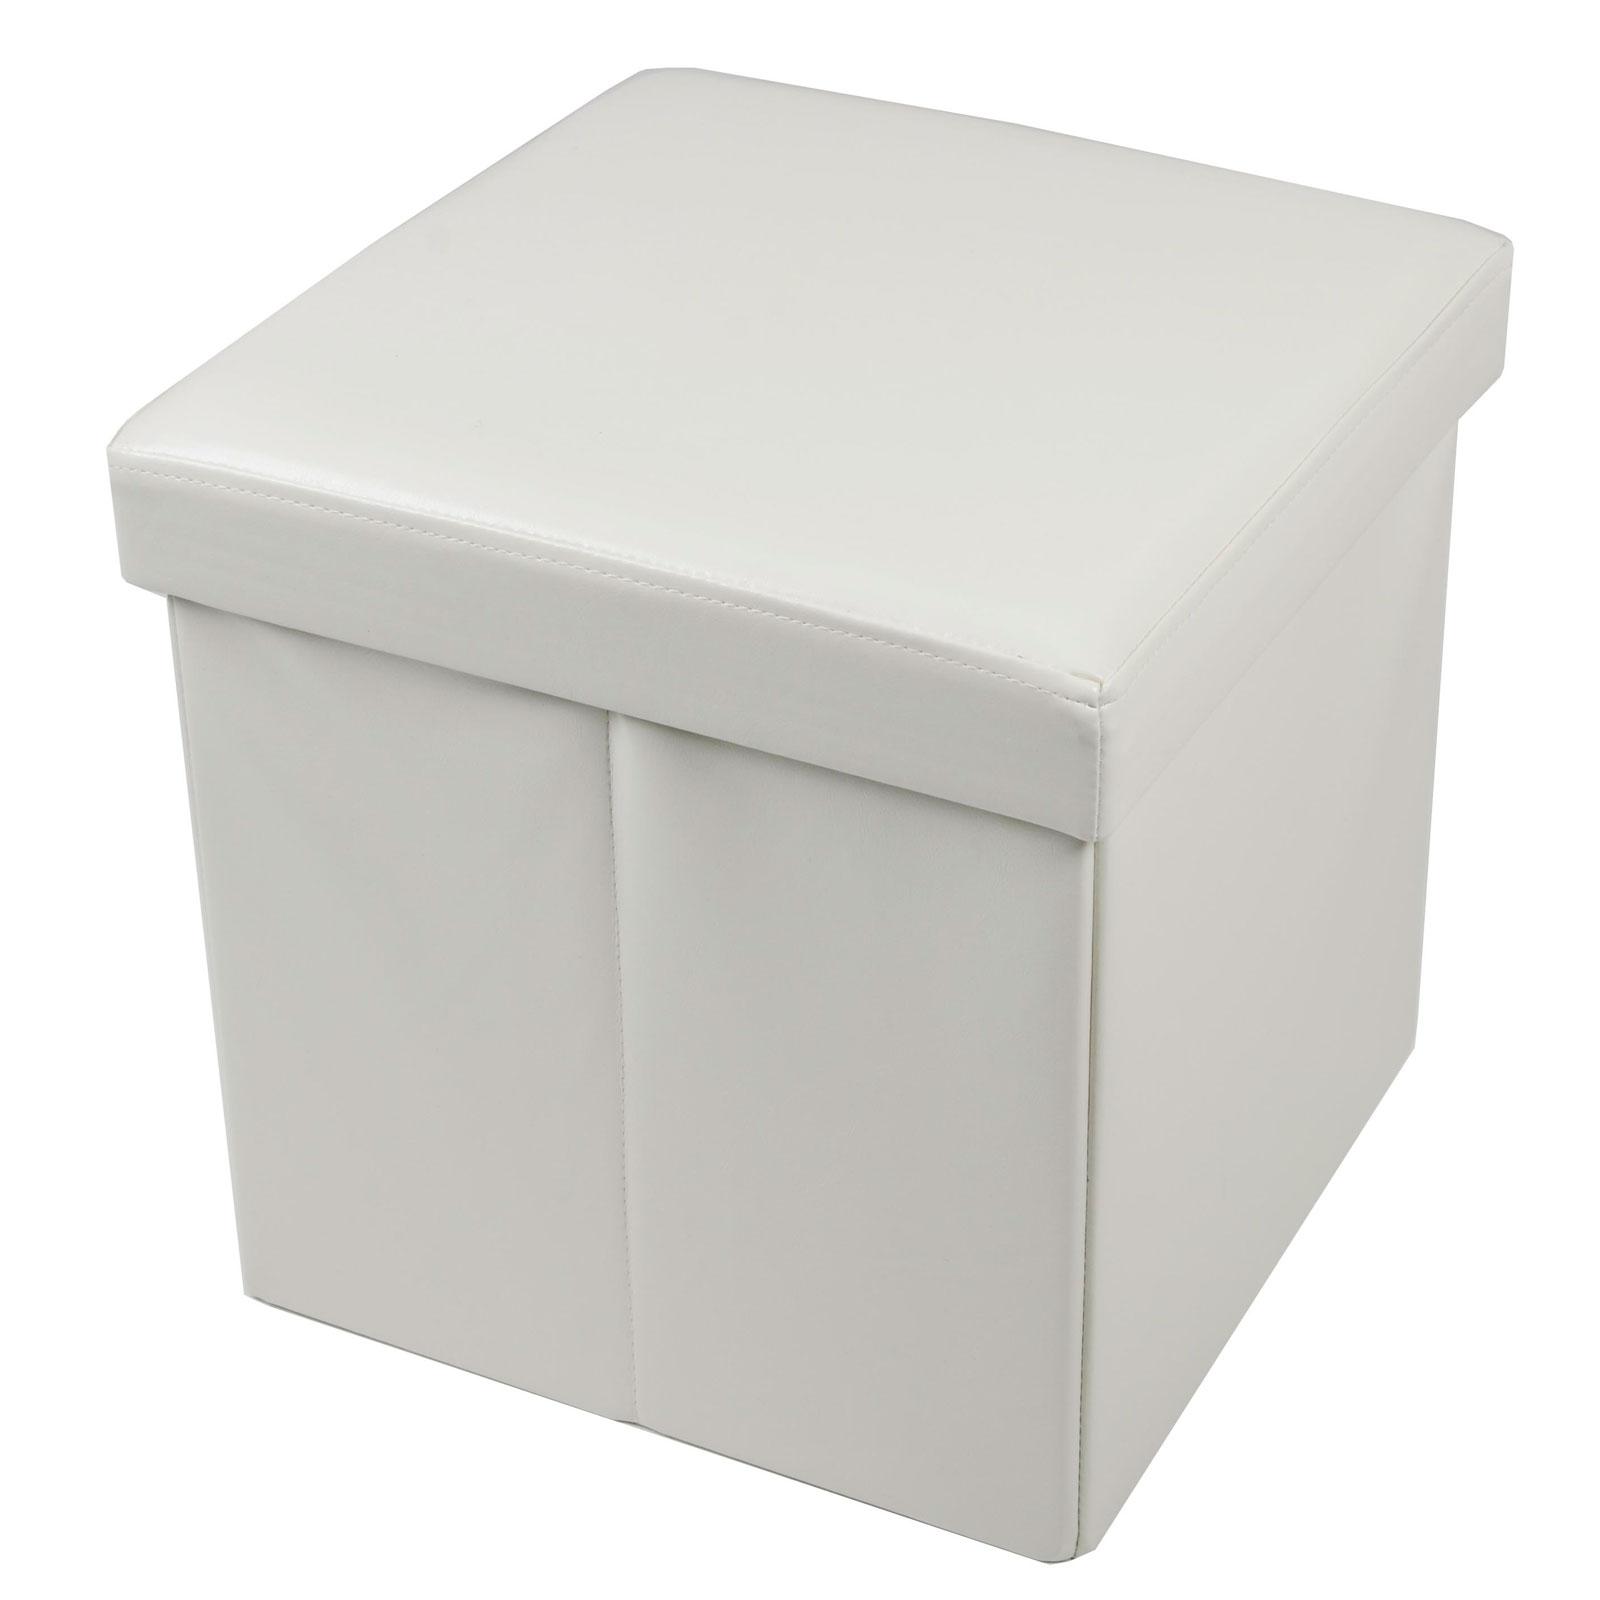 38cm-Folding-Storage-Pouffe-Cube-Foot-Stool-Seat-  sc 1 st  eBay & 38cm Folding Storage Pouffe Cube Foot Stool Seat Ottoman Toy Box ... islam-shia.org